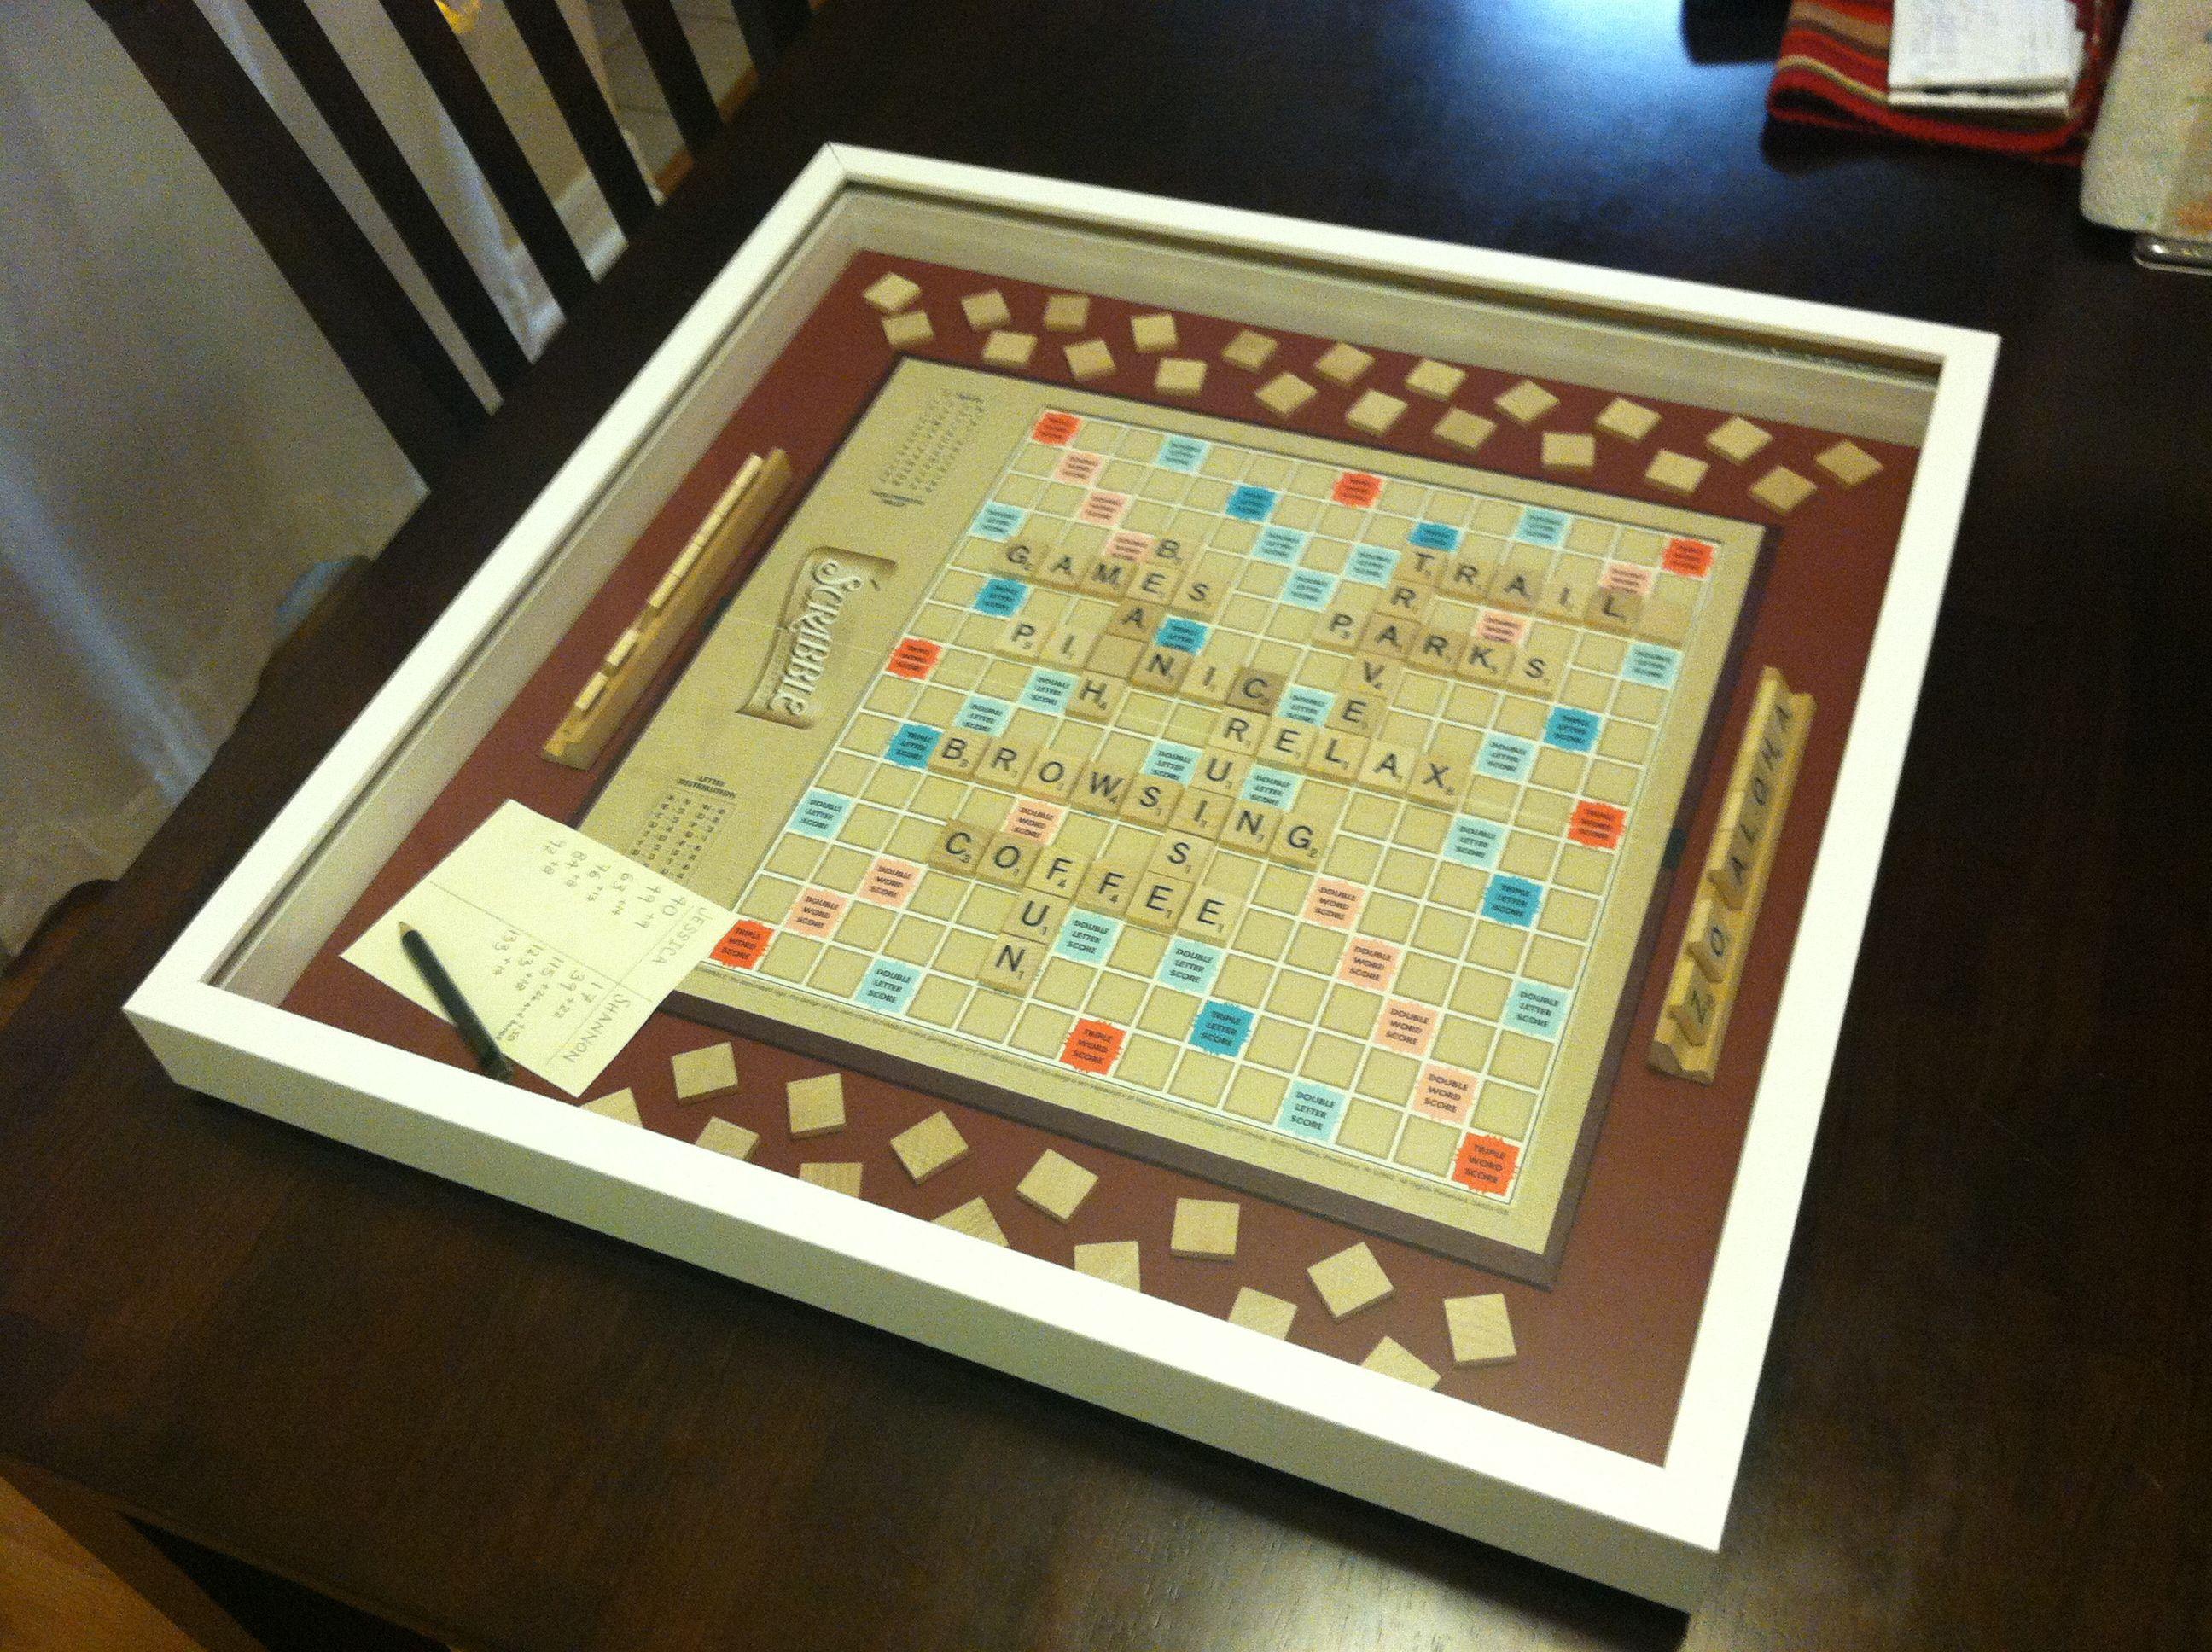 Scrabble Wall Art: Homemade art from an old Scrabble board game ...